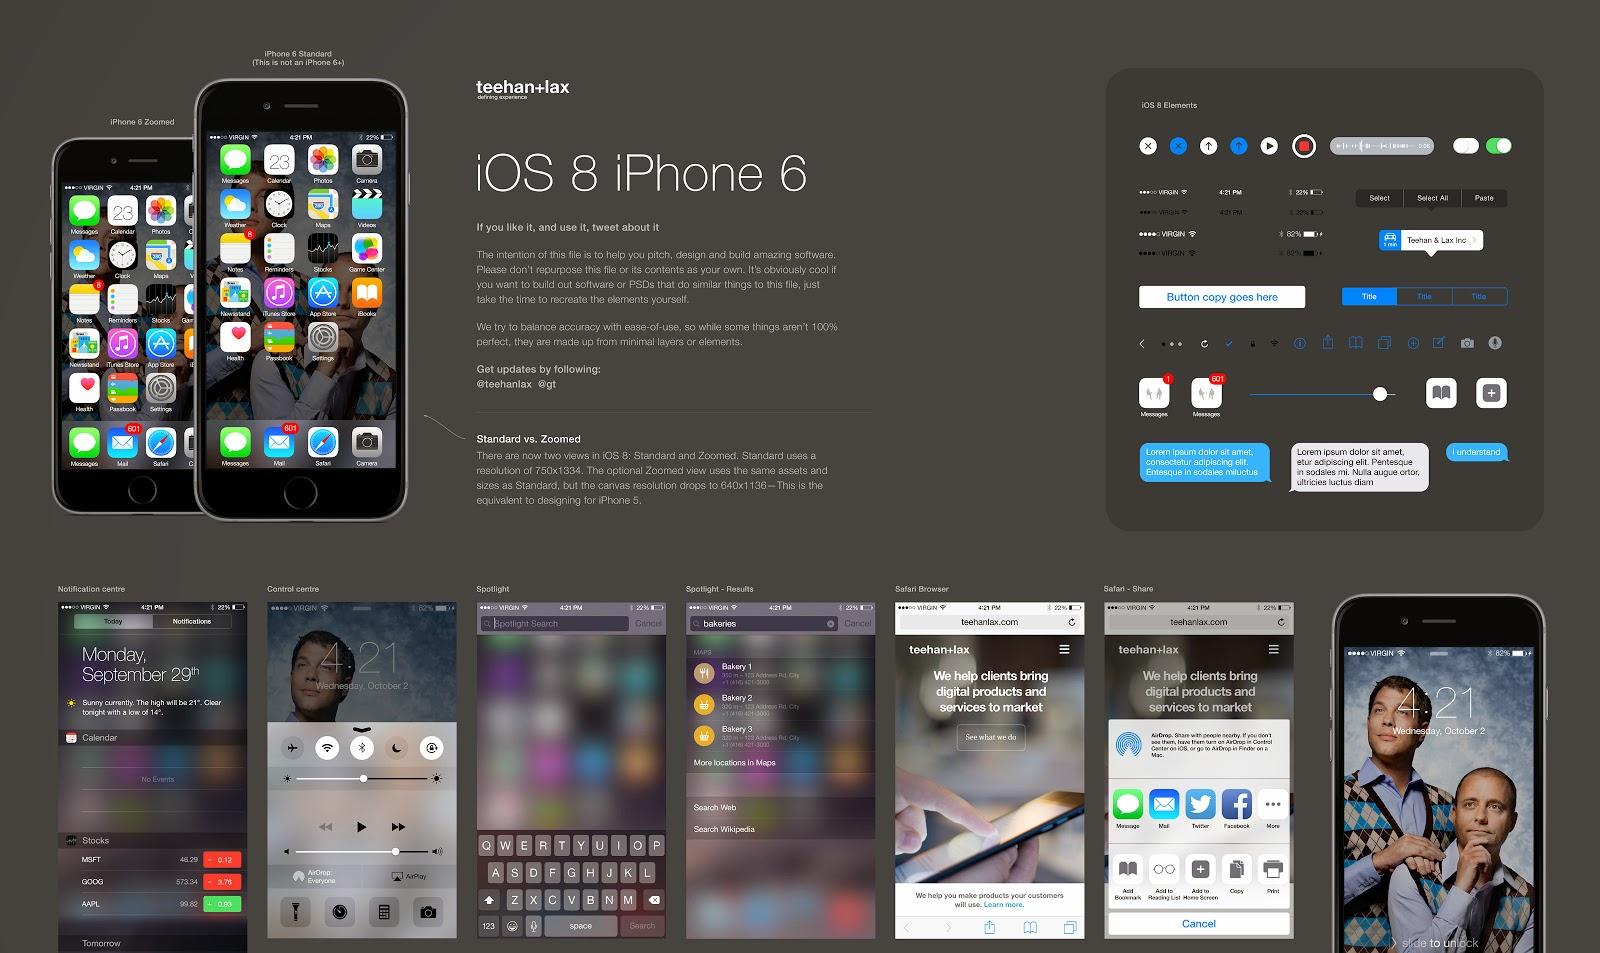 Plantilla de elementos GUI de iOS 8 para Photoshop - SomosDesigners ...